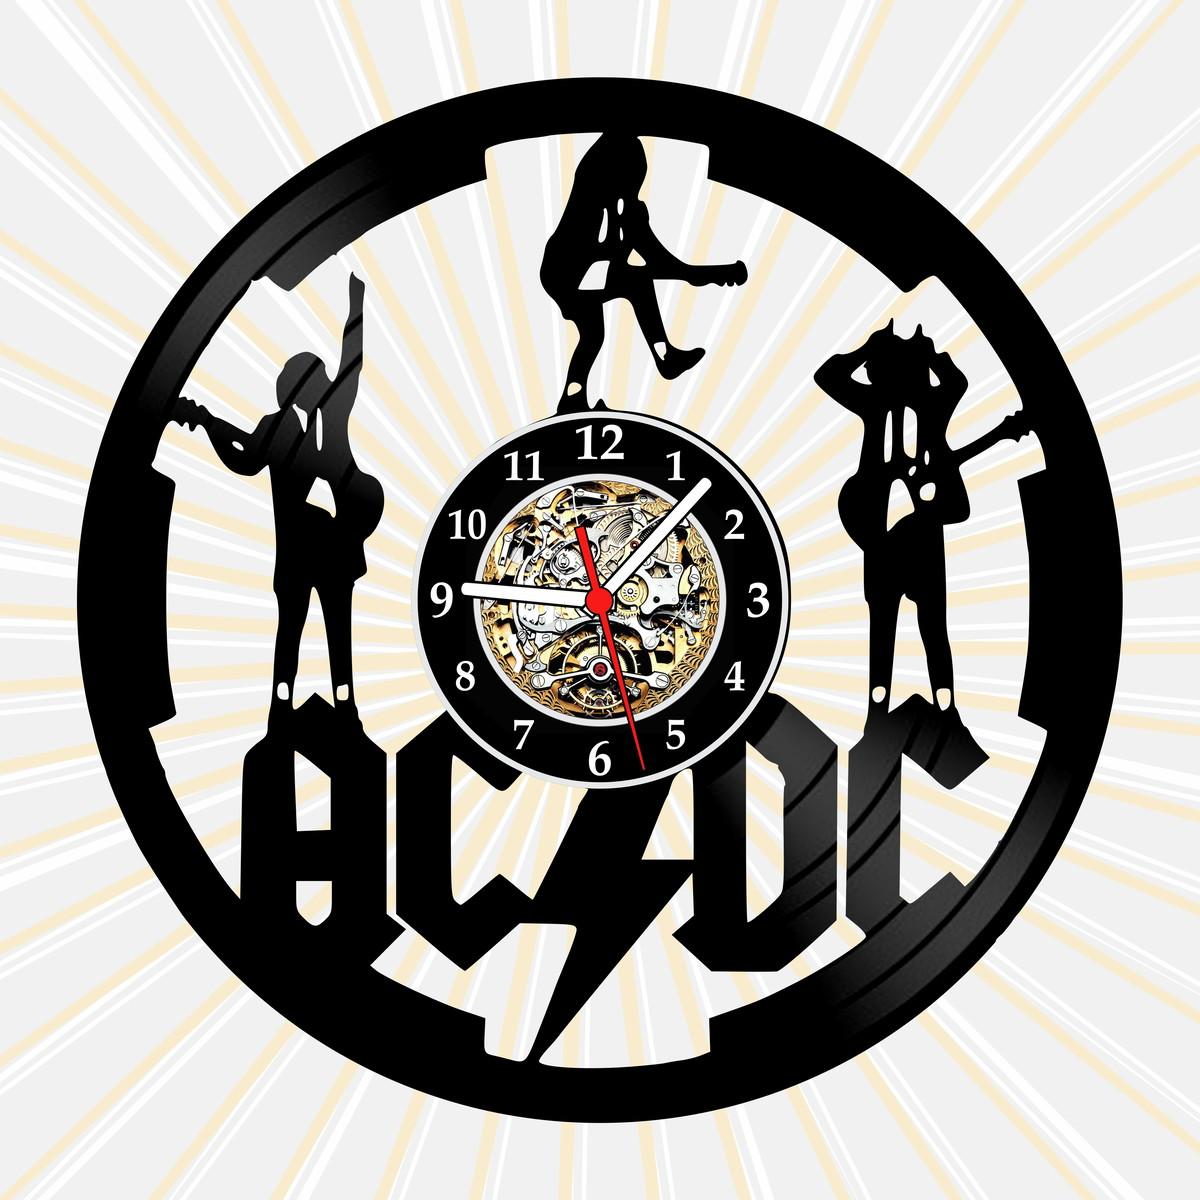 Relógio Parede Acdc Disco Vinil Vintage Anos 80 Bandas Rock